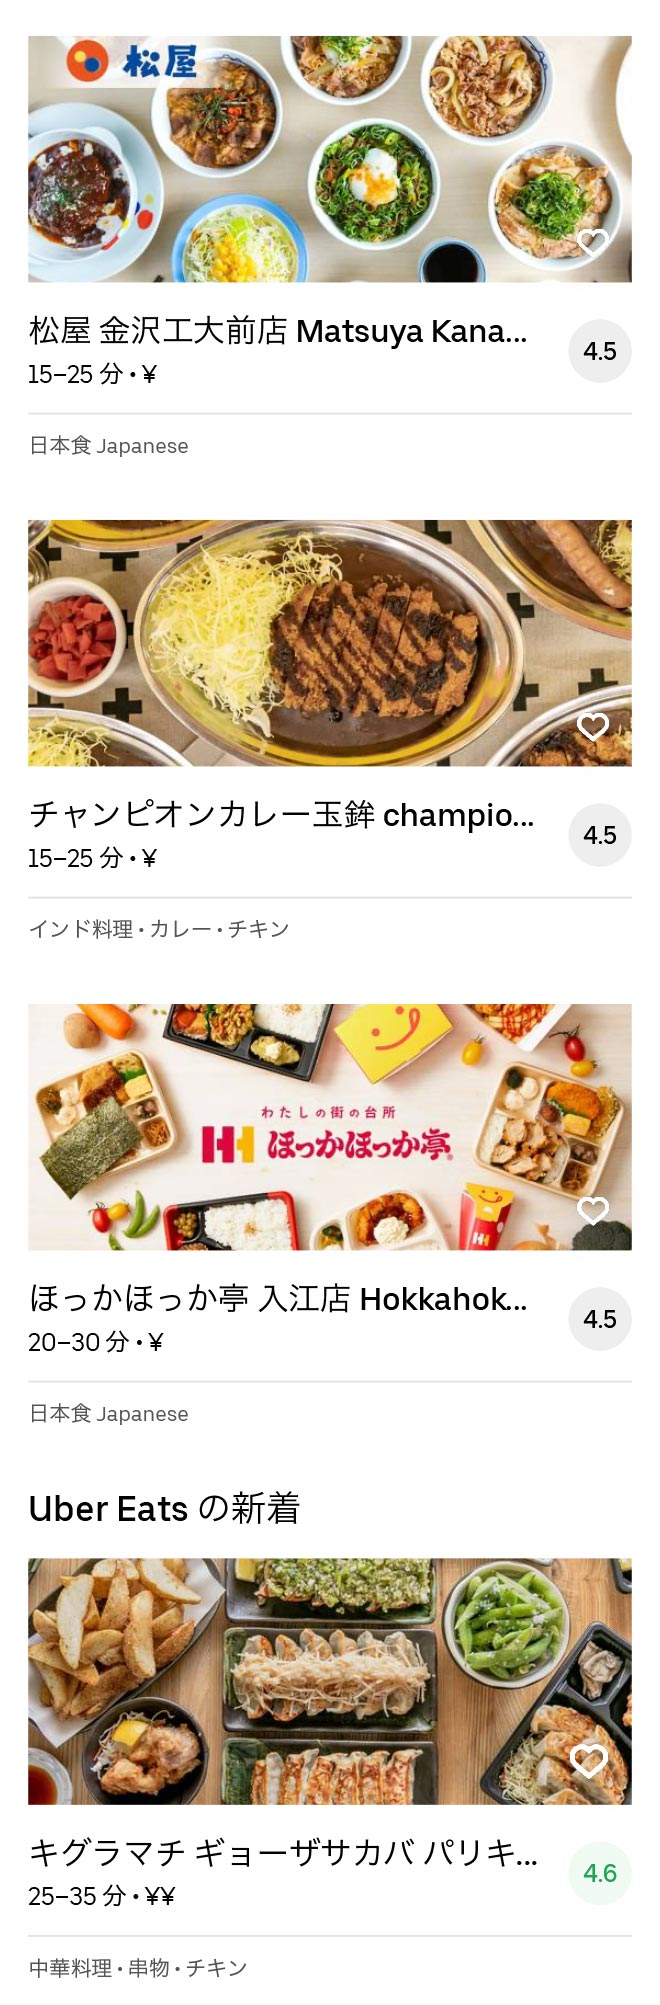 Nishi kanazawa menu 2005 02